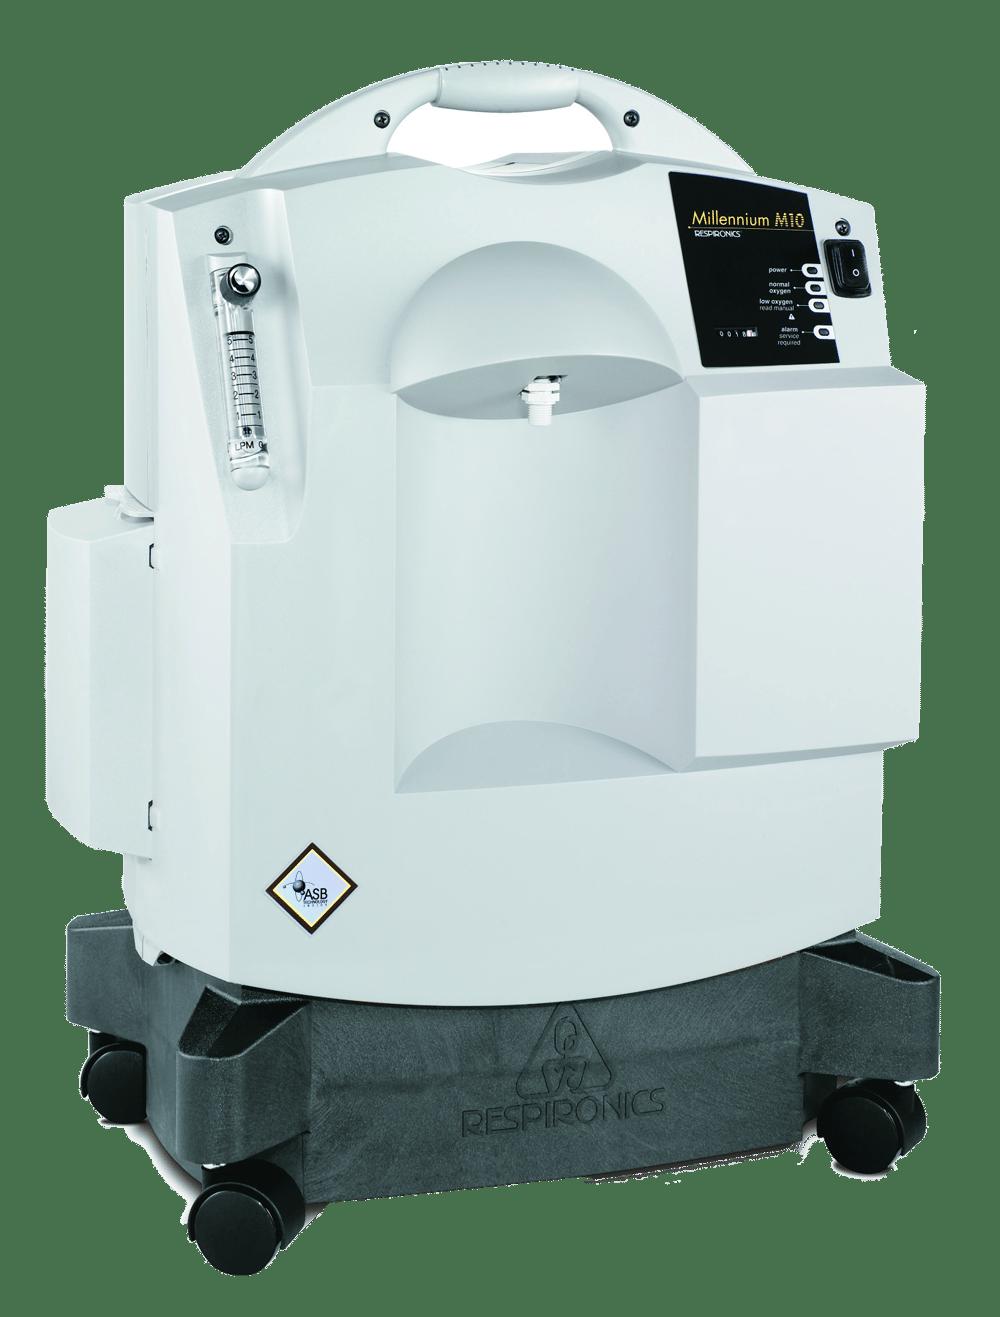 Respironics Millennium M10 Home Oxygen Concentrator